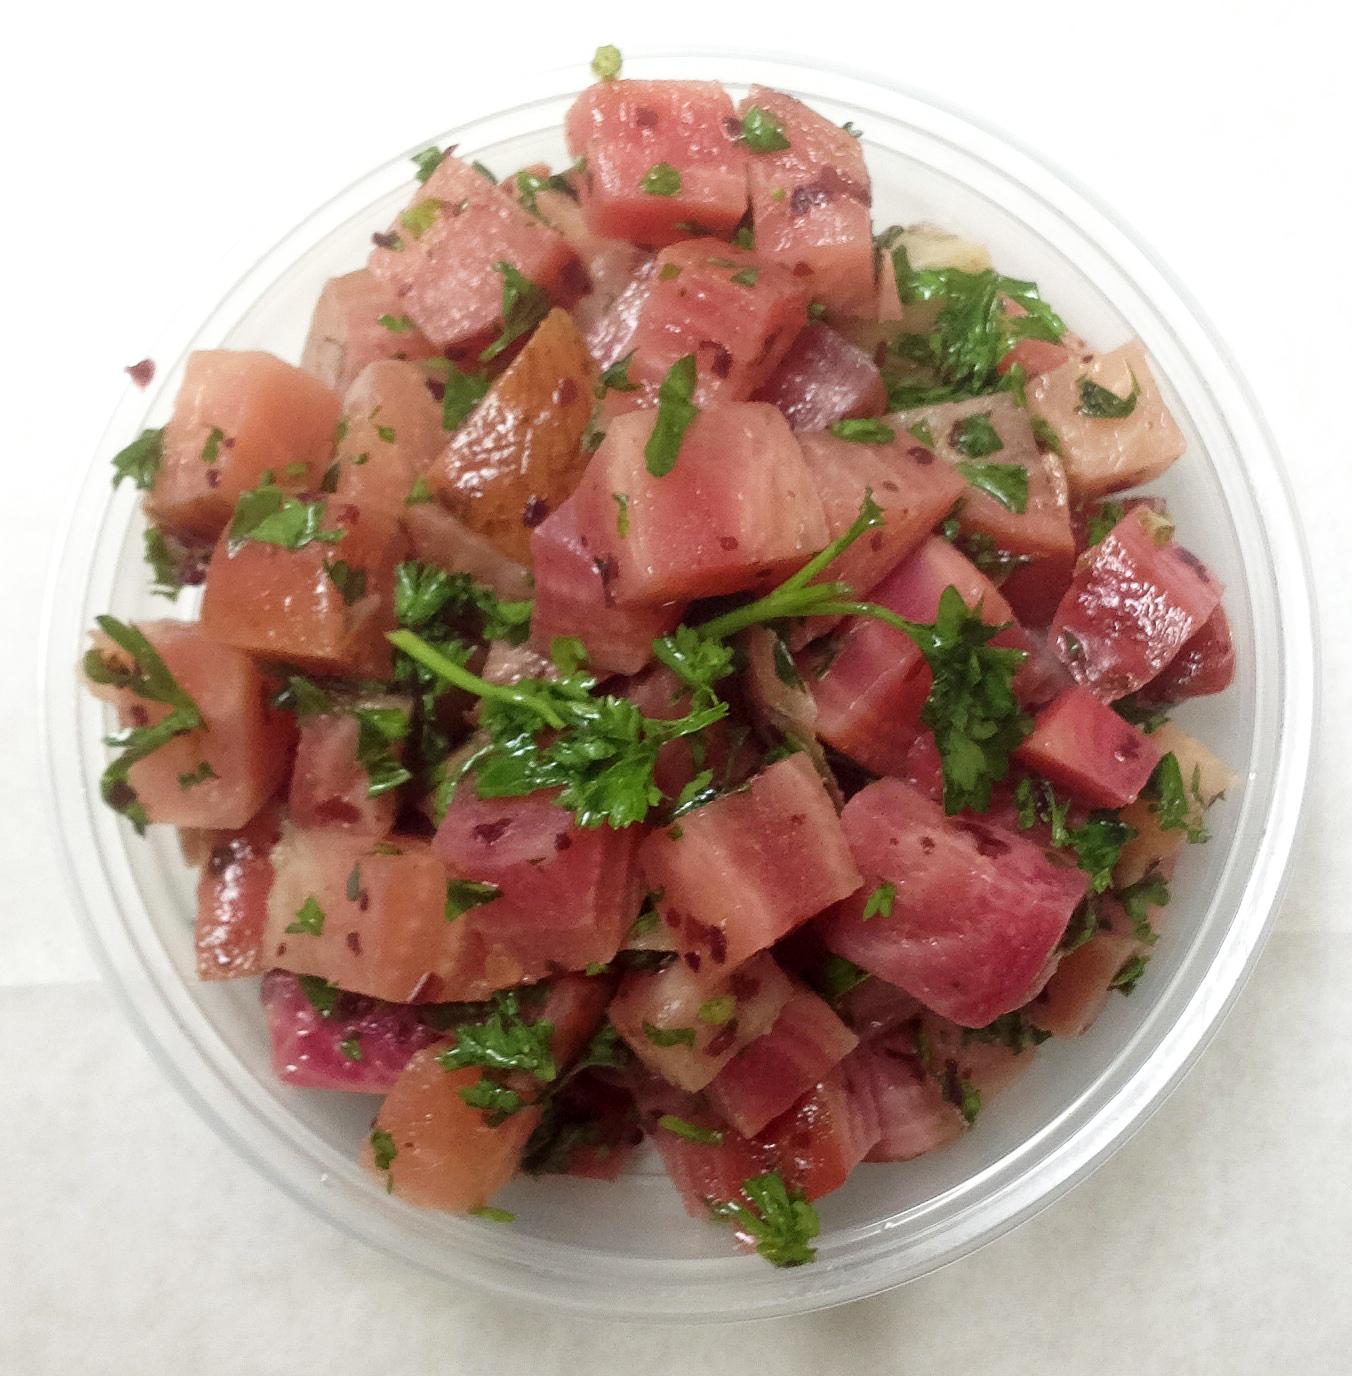 watermelon-radish